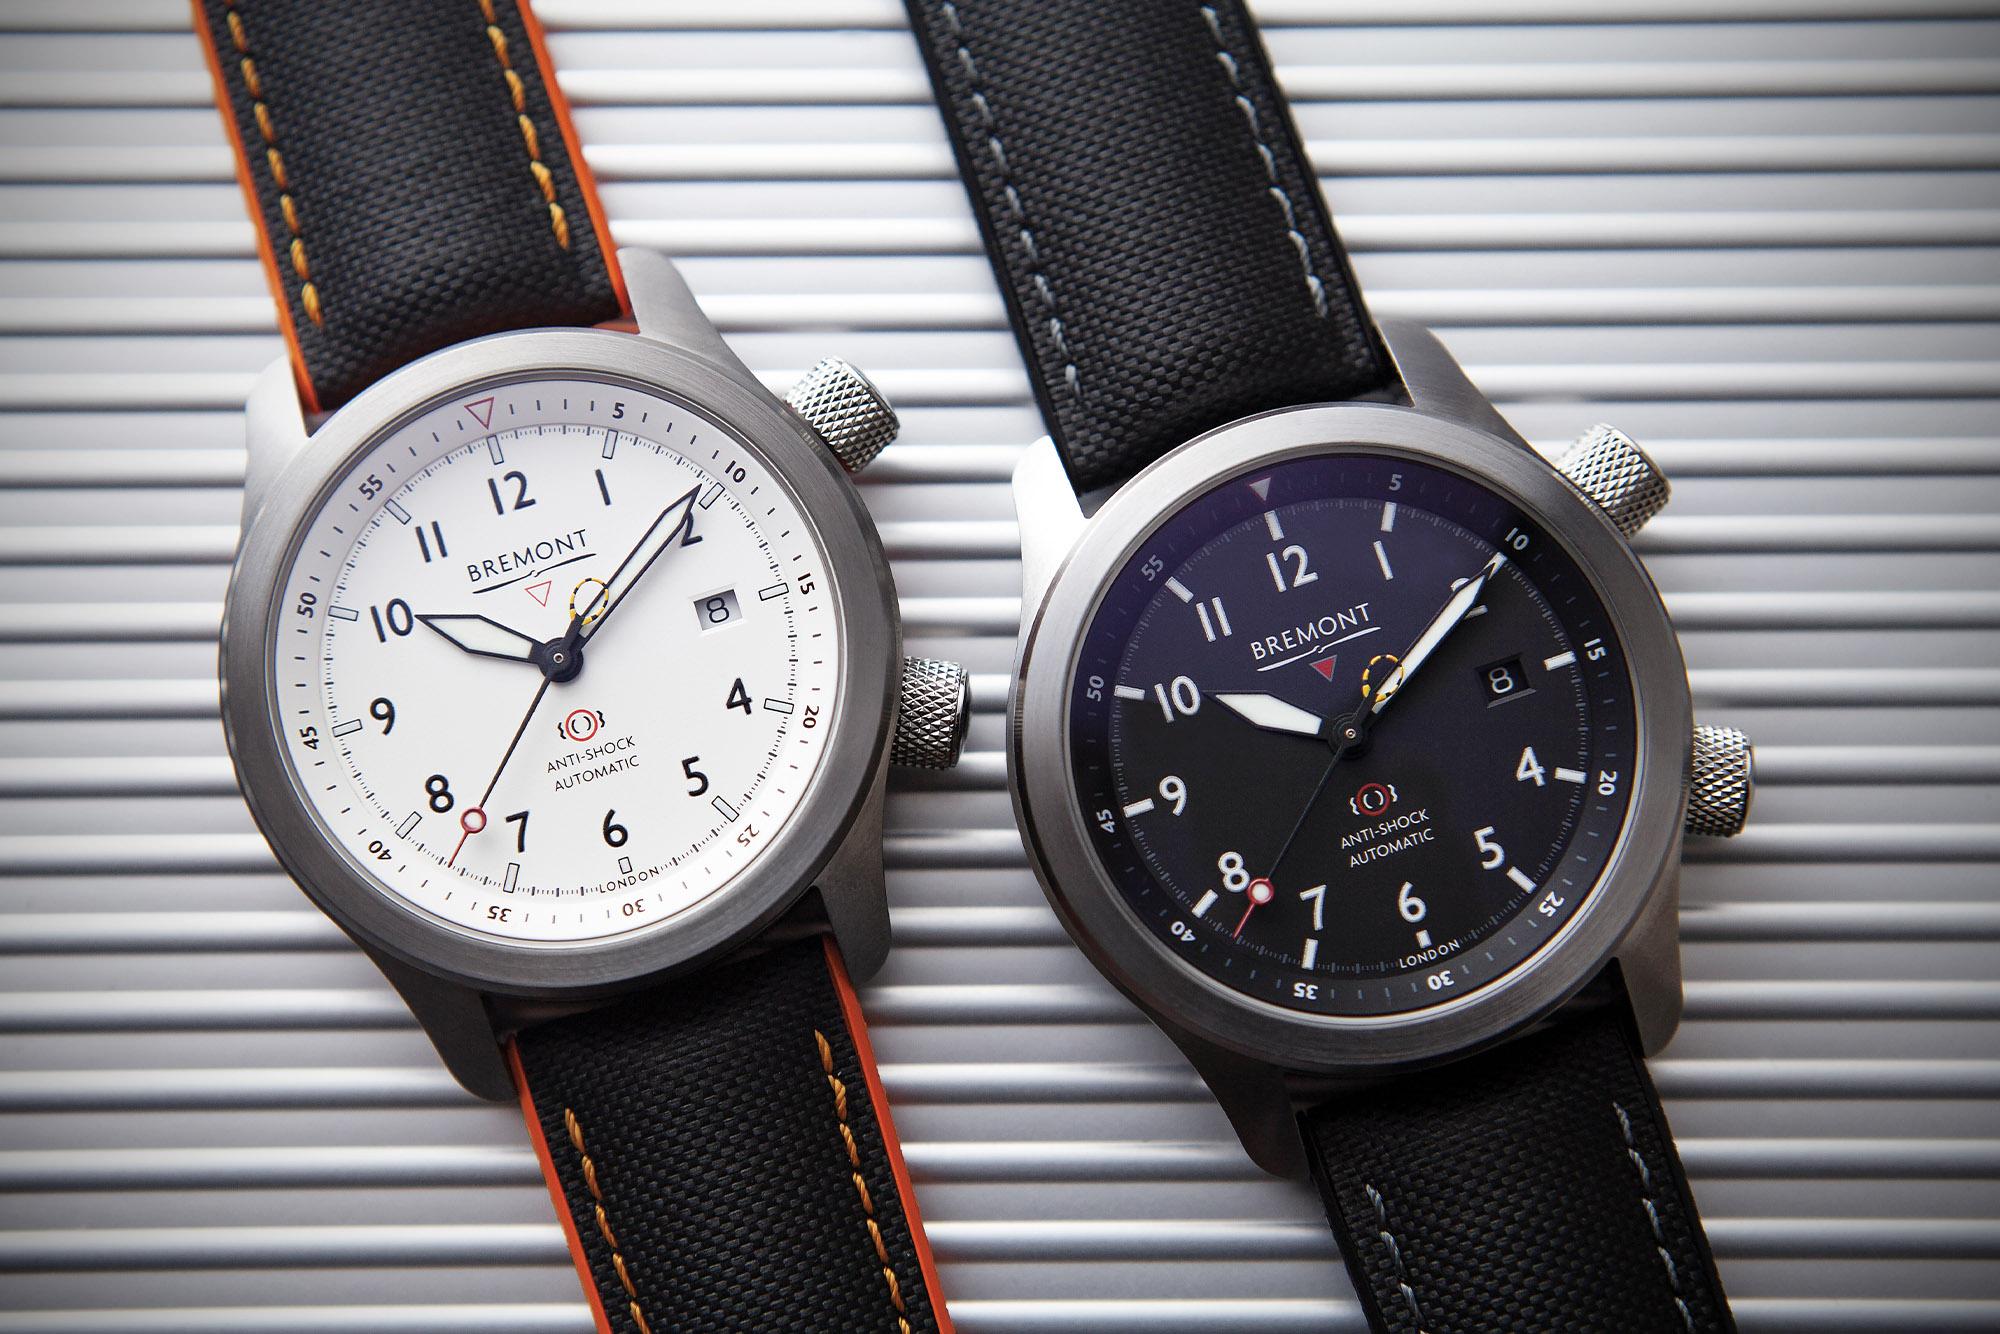 Bremont MB-II watches